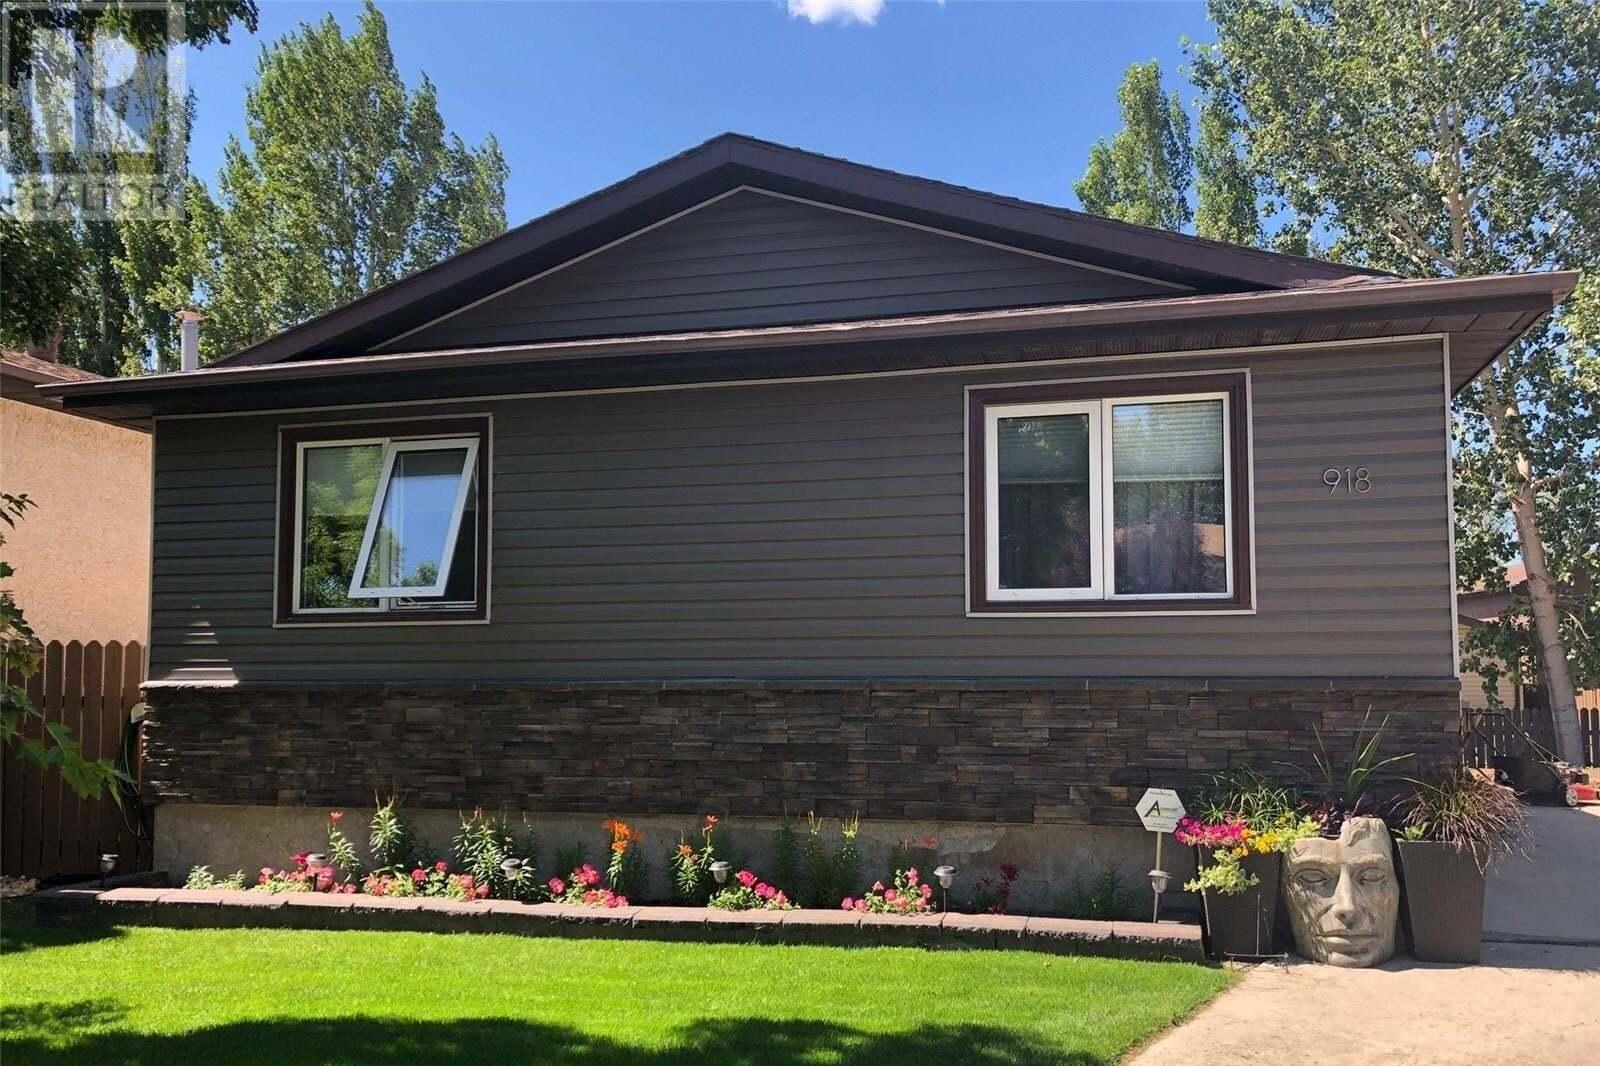 House for sale at 918 East By Regina Saskatchewan - MLS: SK827328